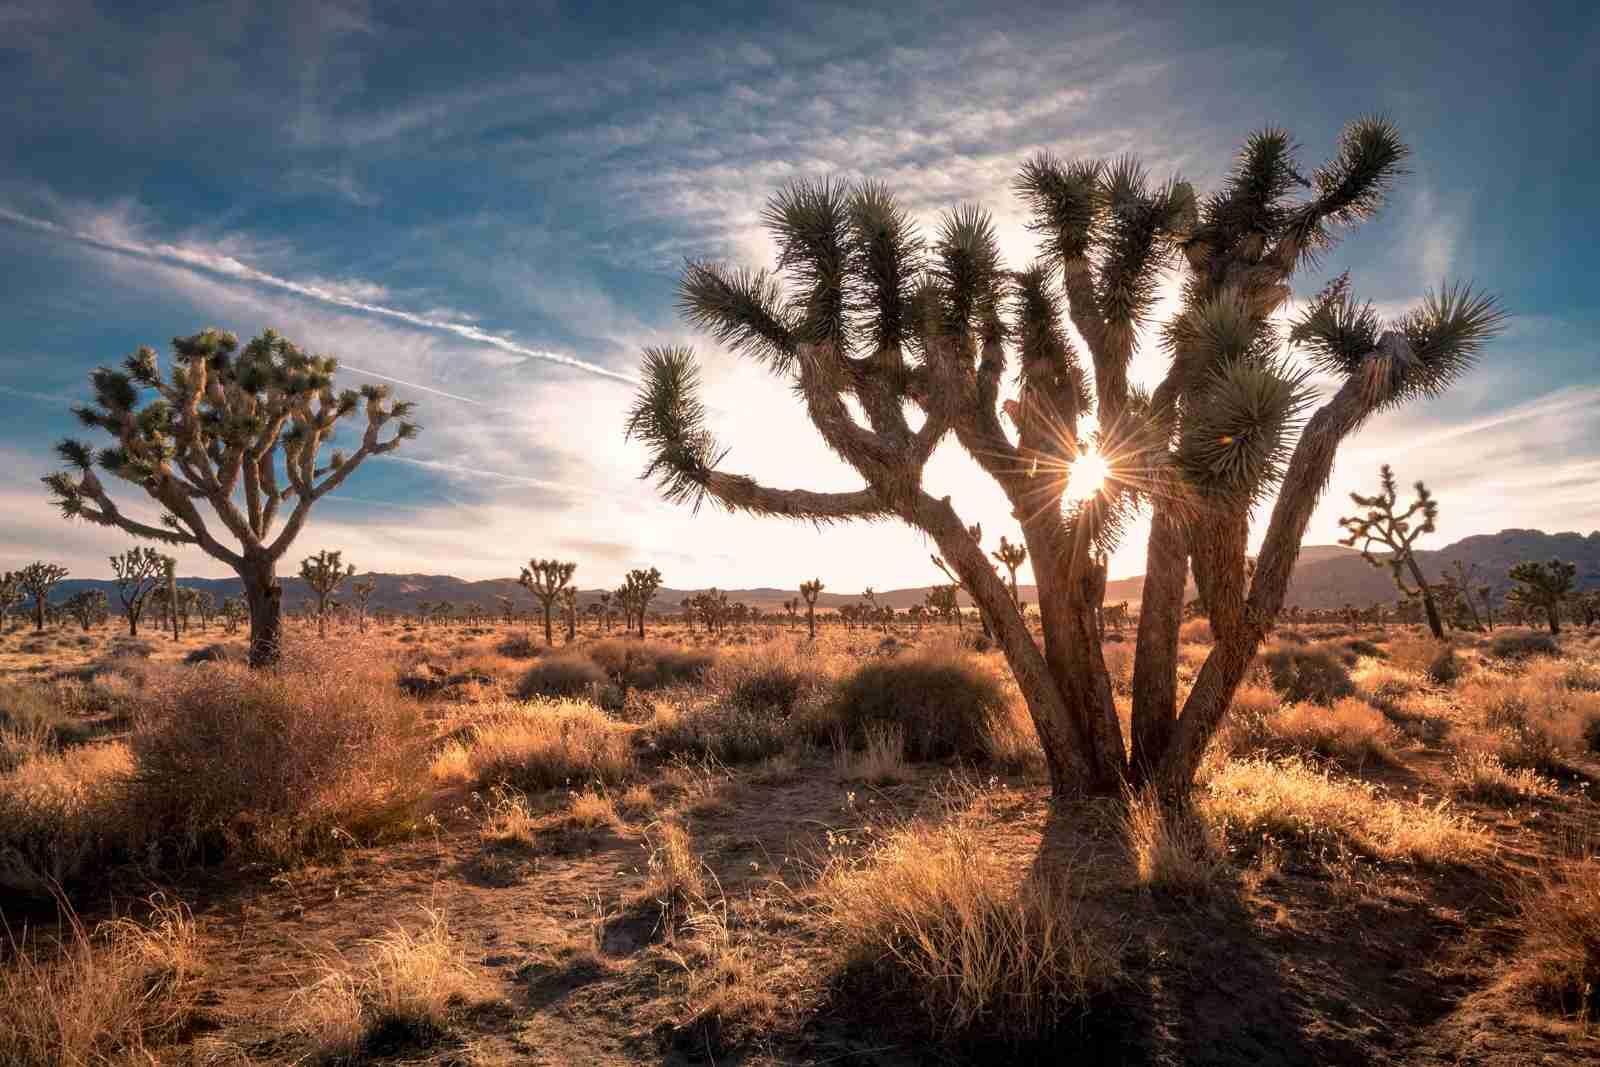 Joshua Tree National Park. (Photo by frank1crayon/Adobe Stock)